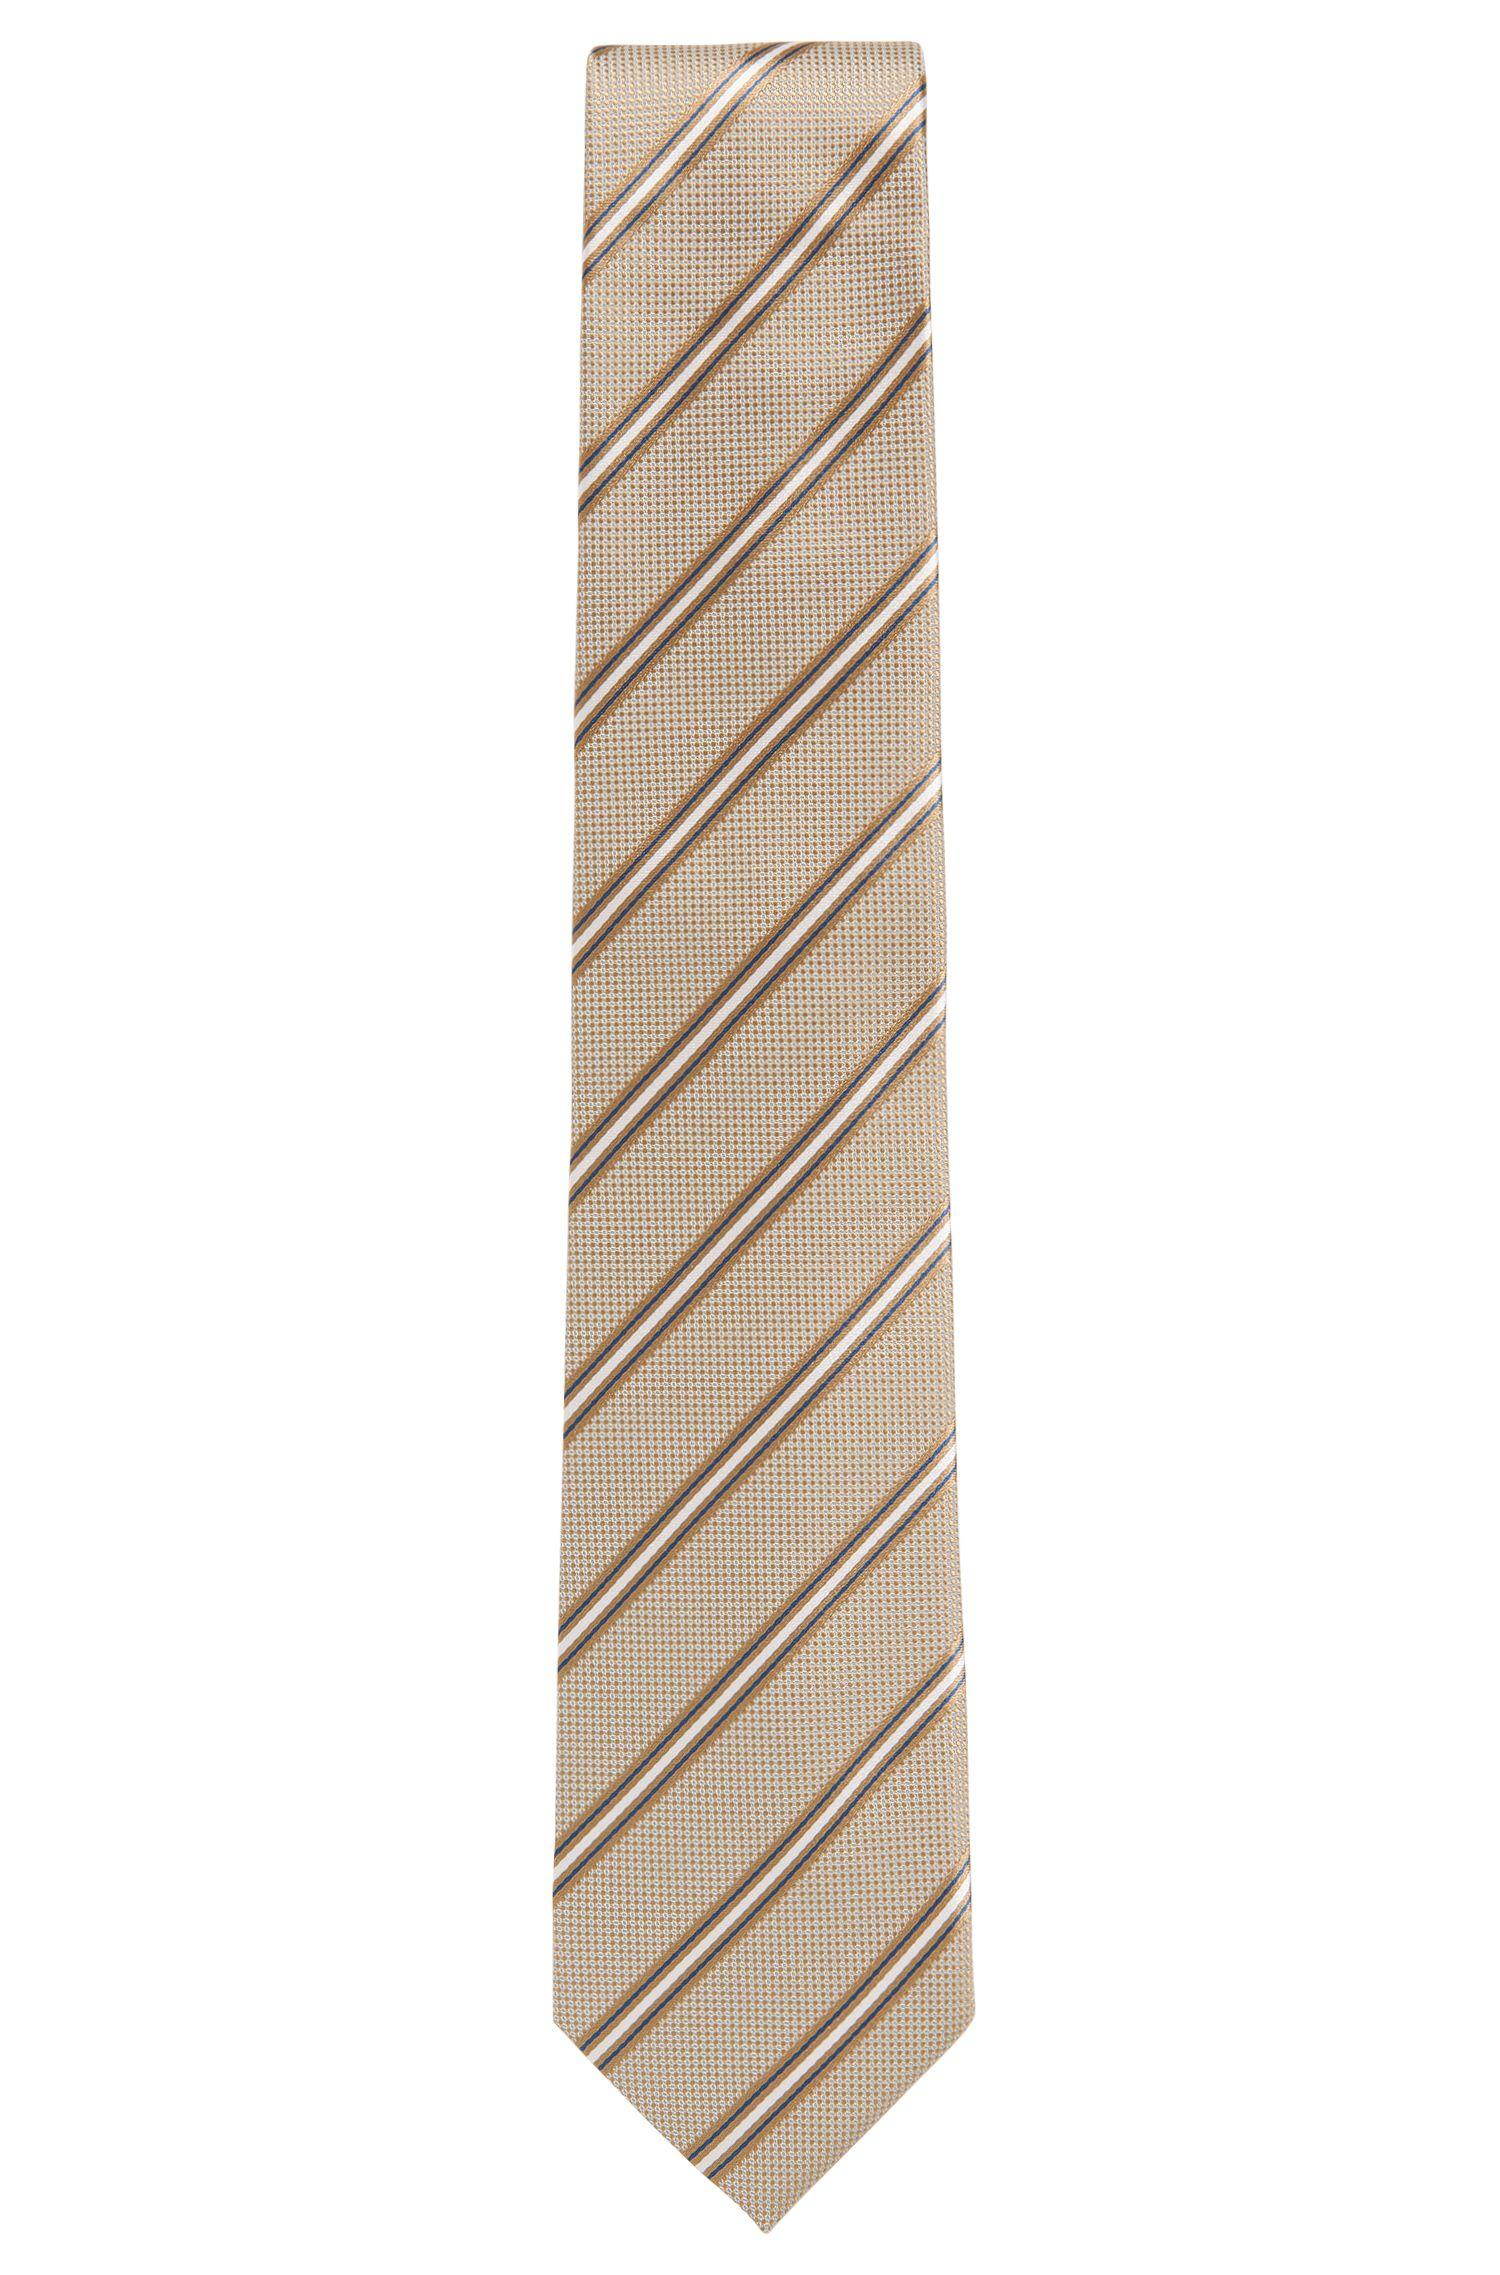 Italian-made silk-jacquard tie with diagonal stripe